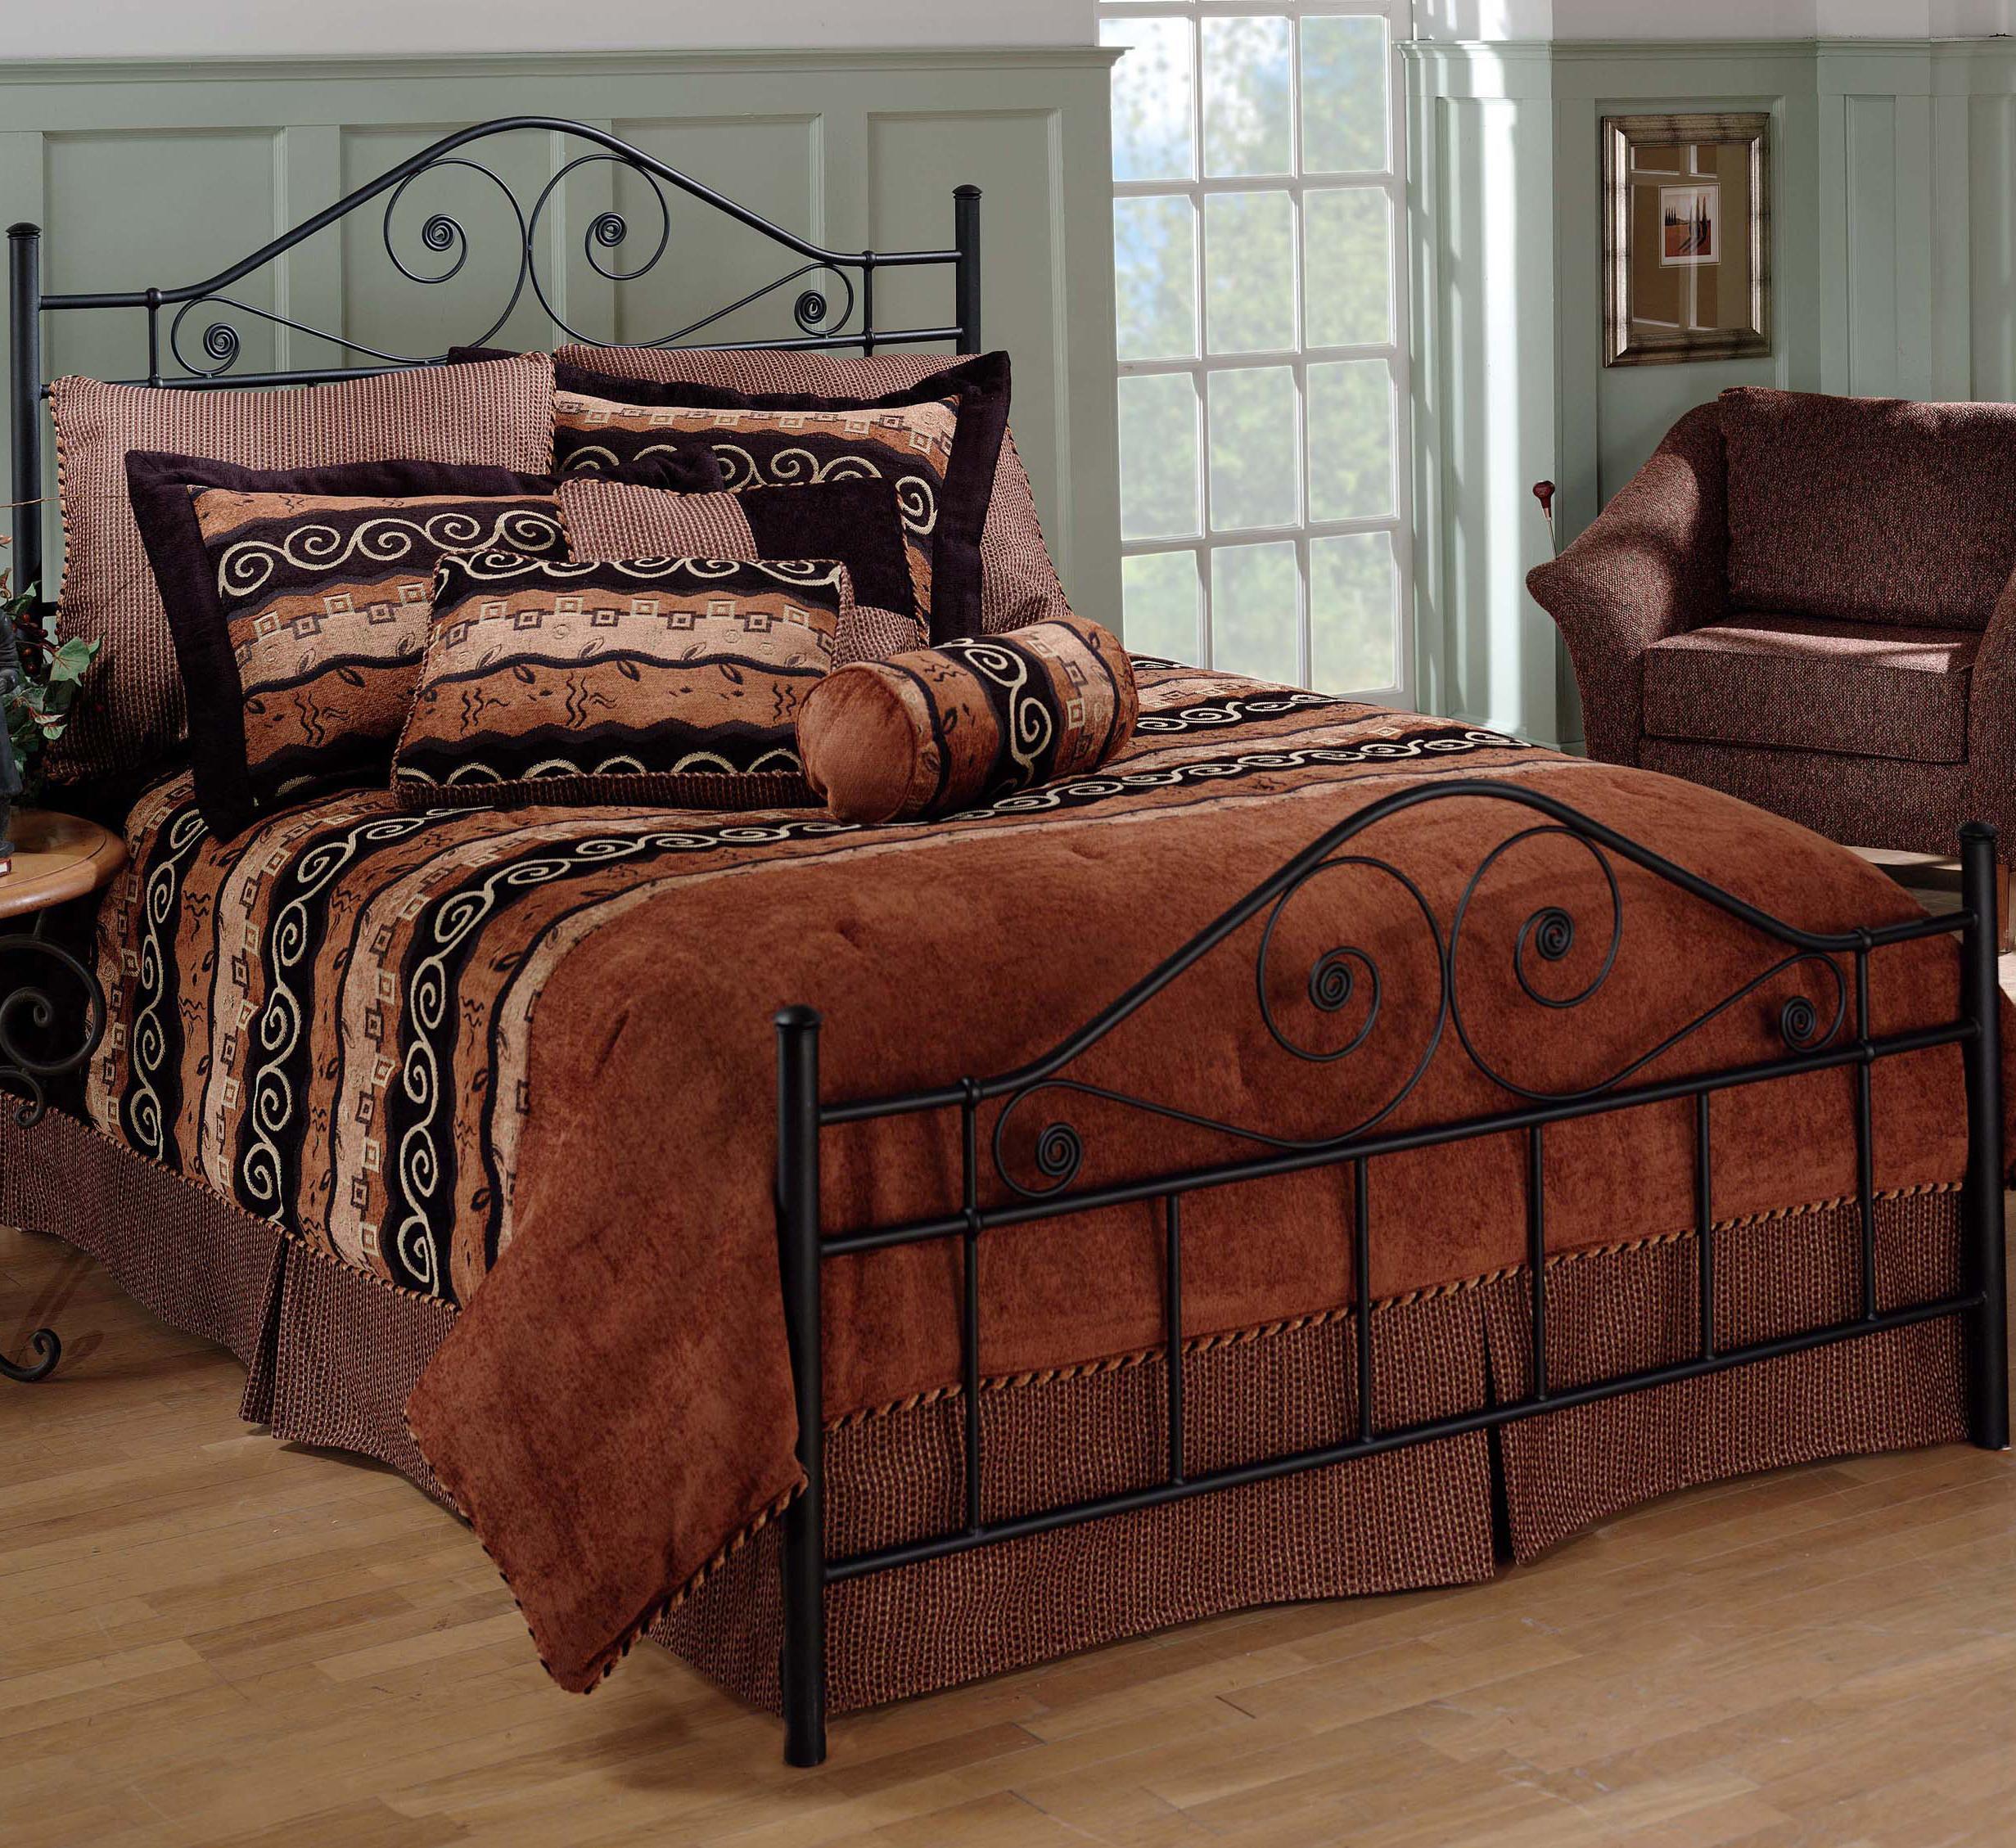 Metal Beds King Harrison Bed by Hillsdale at Steger's Furniture